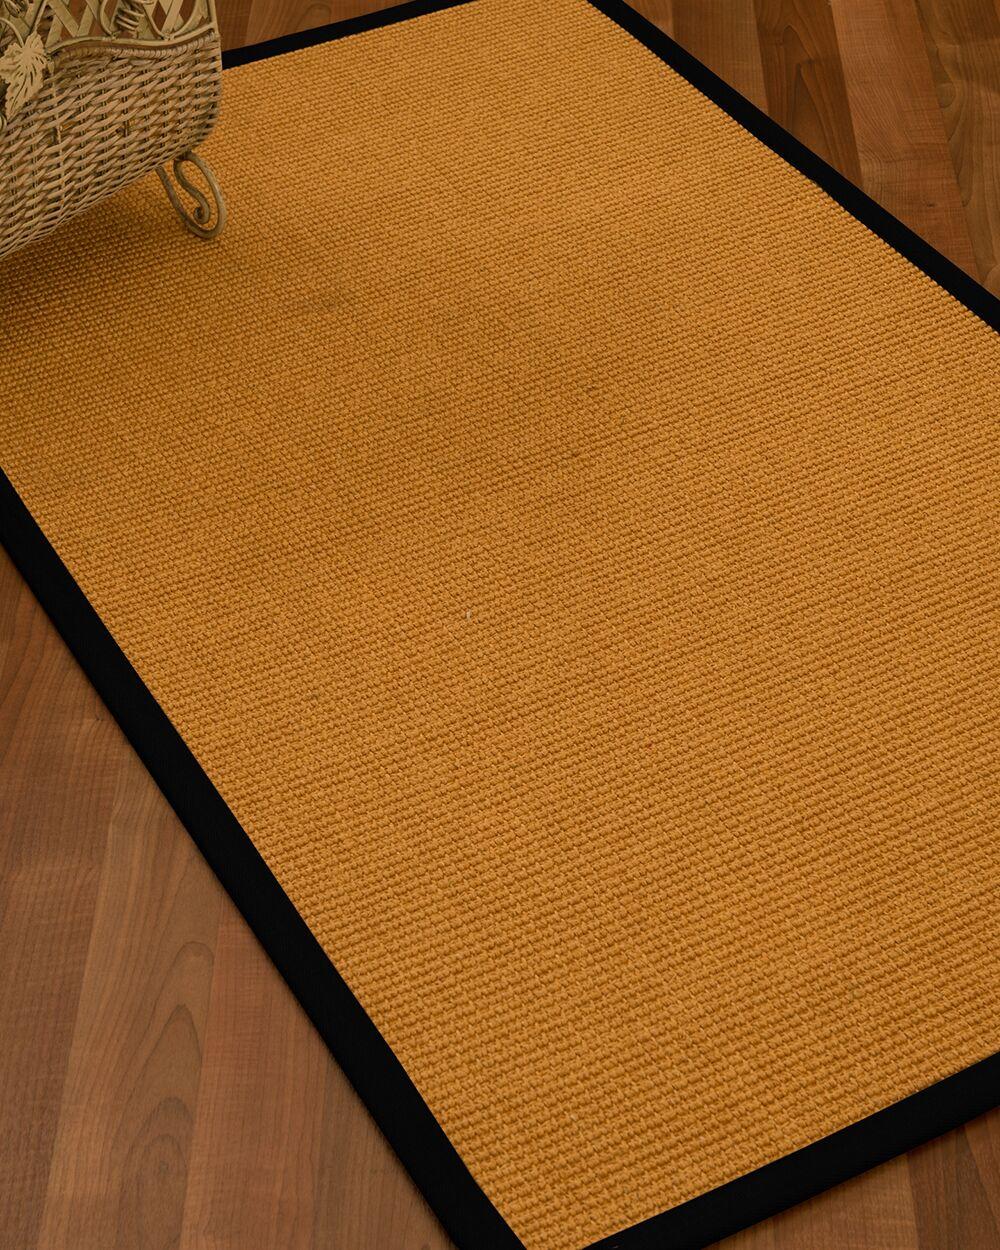 Bullen Hand-Woven Beige Area Rug Rug Size: Rectangle 8' x 10'